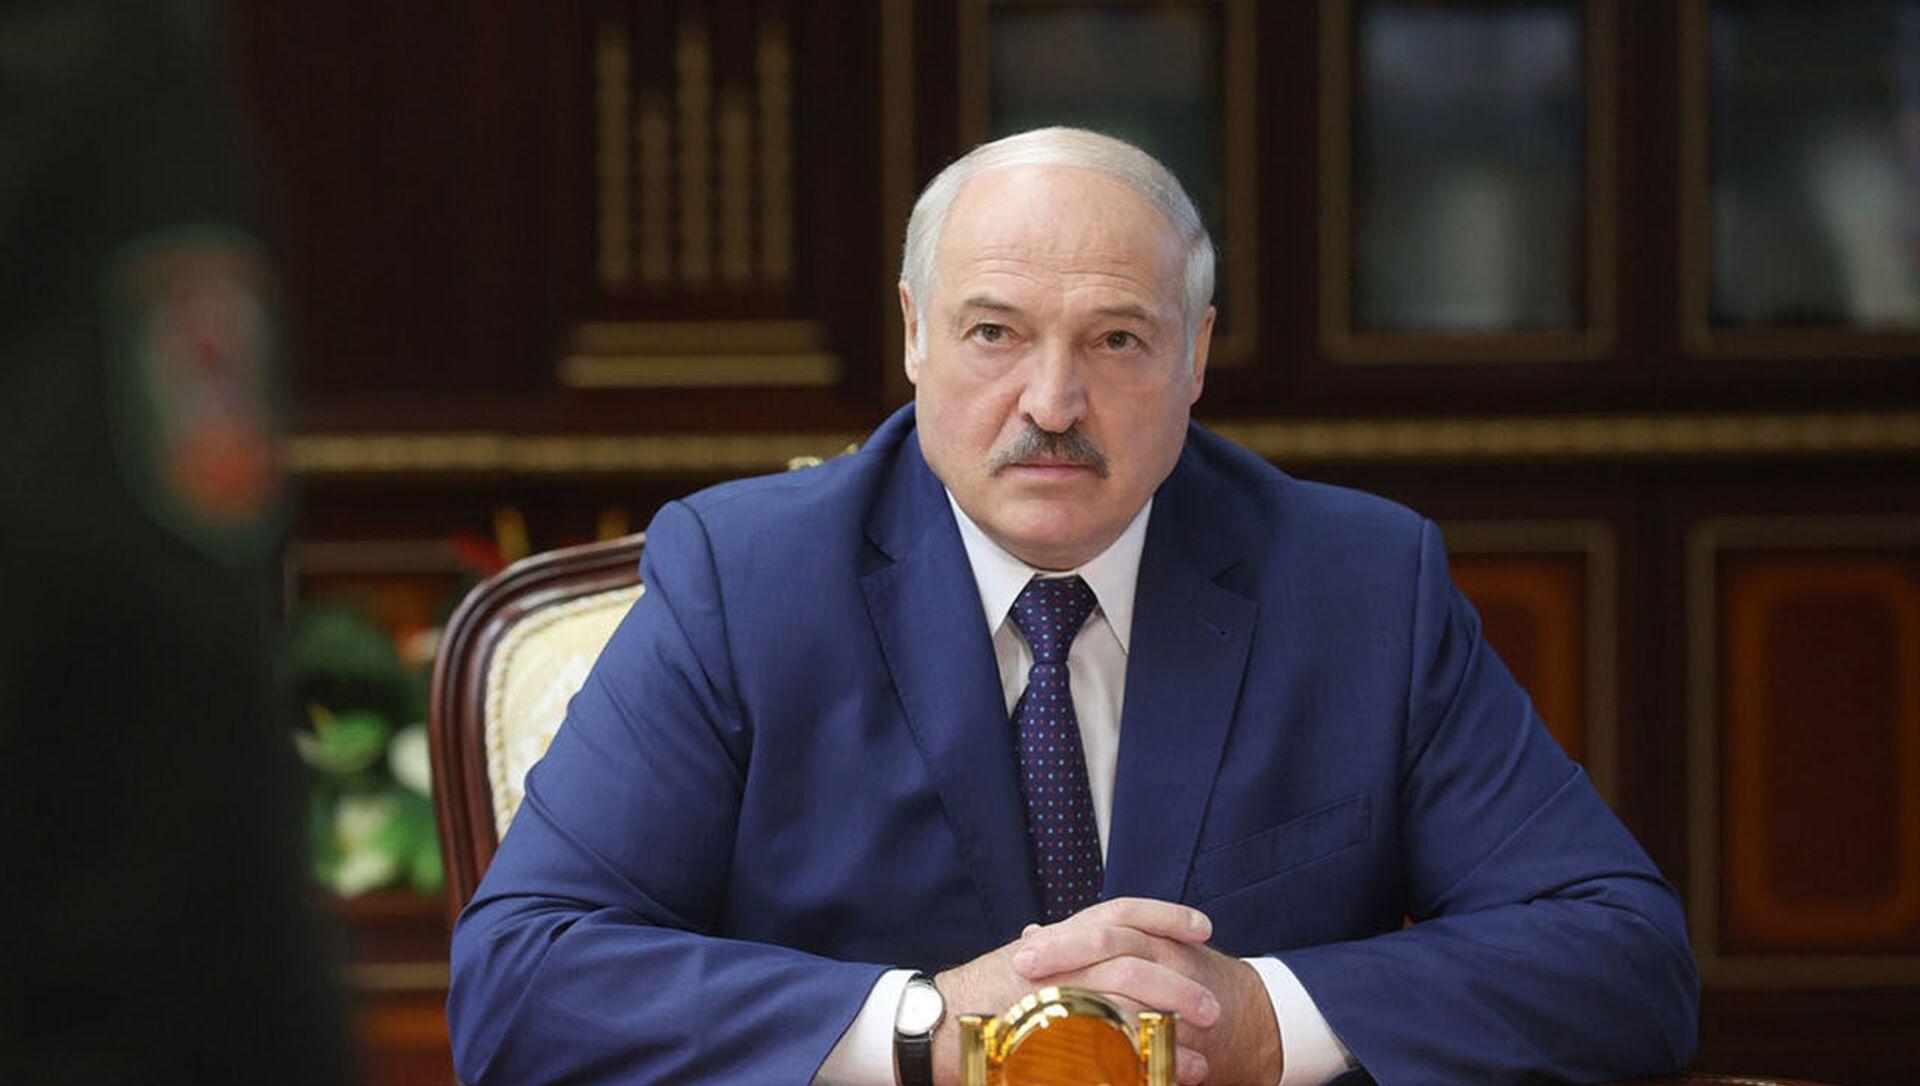 Tổng thống Belarus Alexander Lukashenko - Sputnik Việt Nam, 1920, 09.08.2021